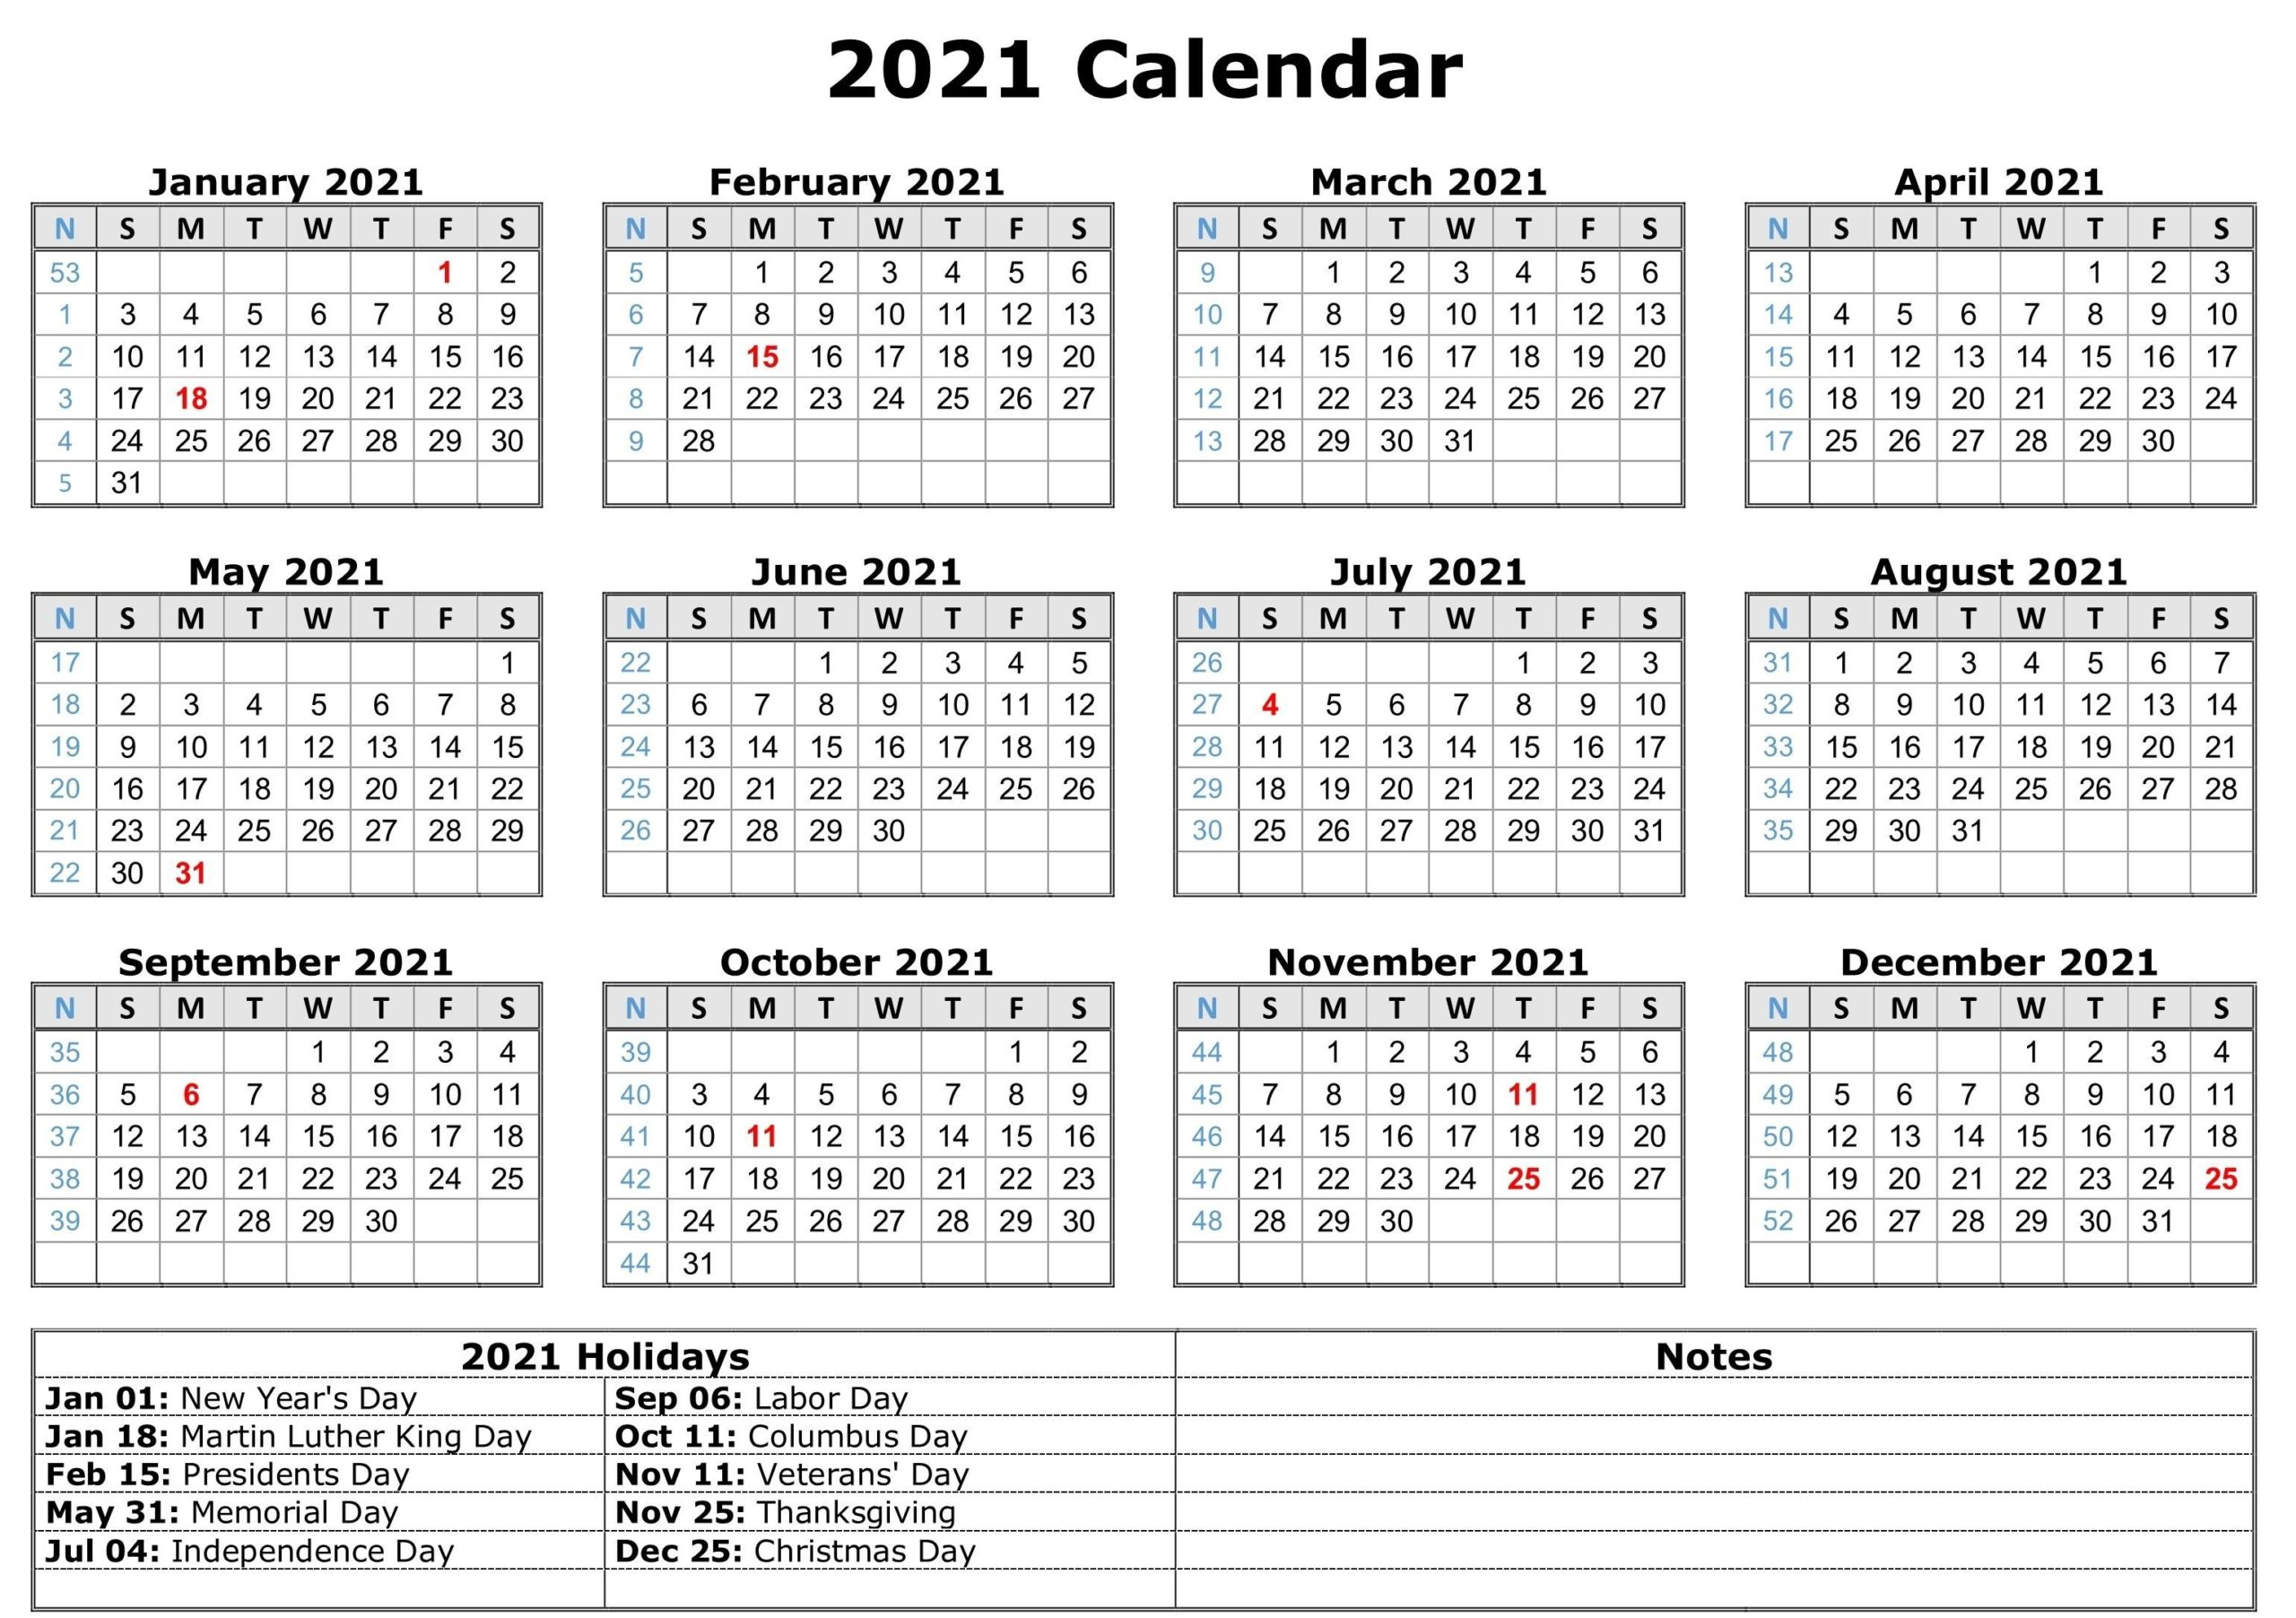 Blank 2021 Calendar Printable | Calendar 2021 Within 2021 Calendar With Federal Printabl